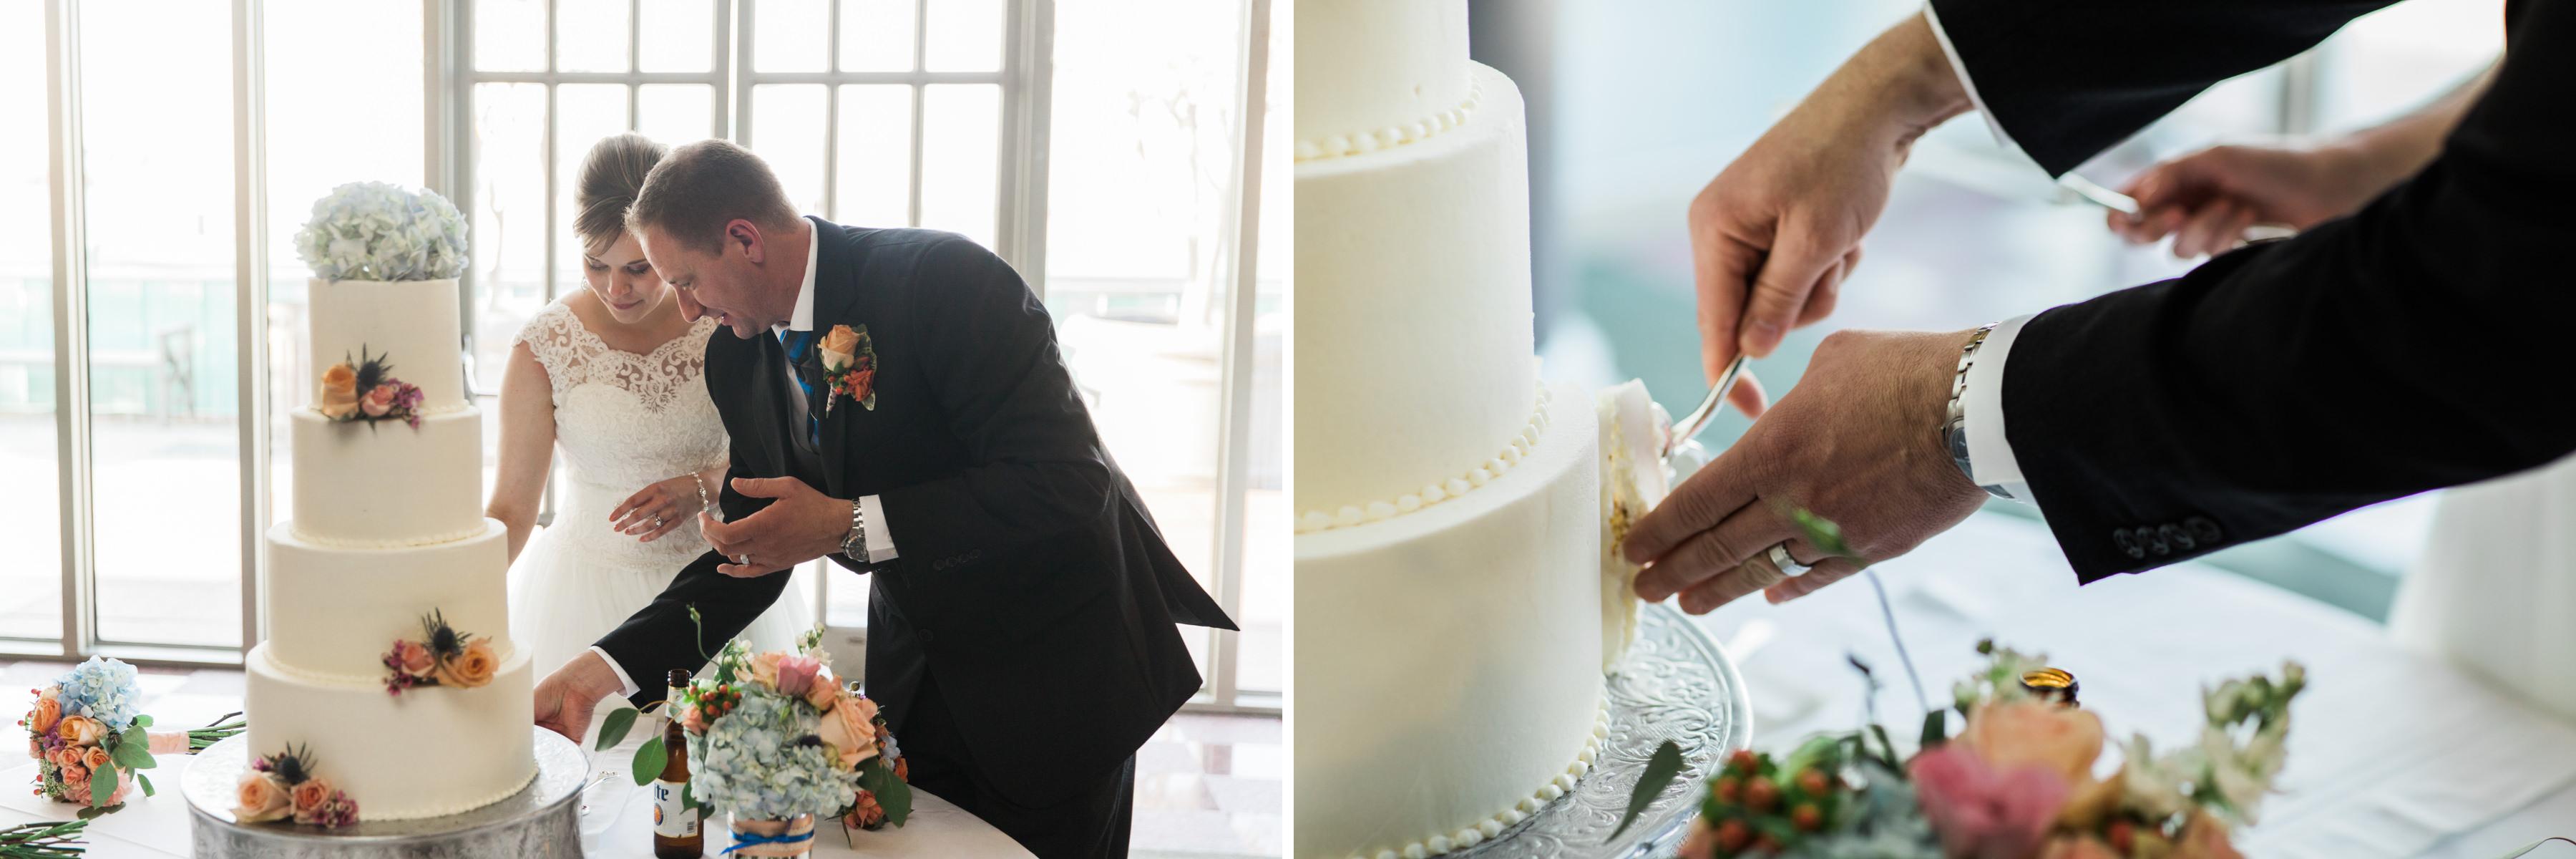 MAULDIN_WEDDING_MONTGOMERY_ALABAMA_WEDDING_PHOTOGRAPHY_109